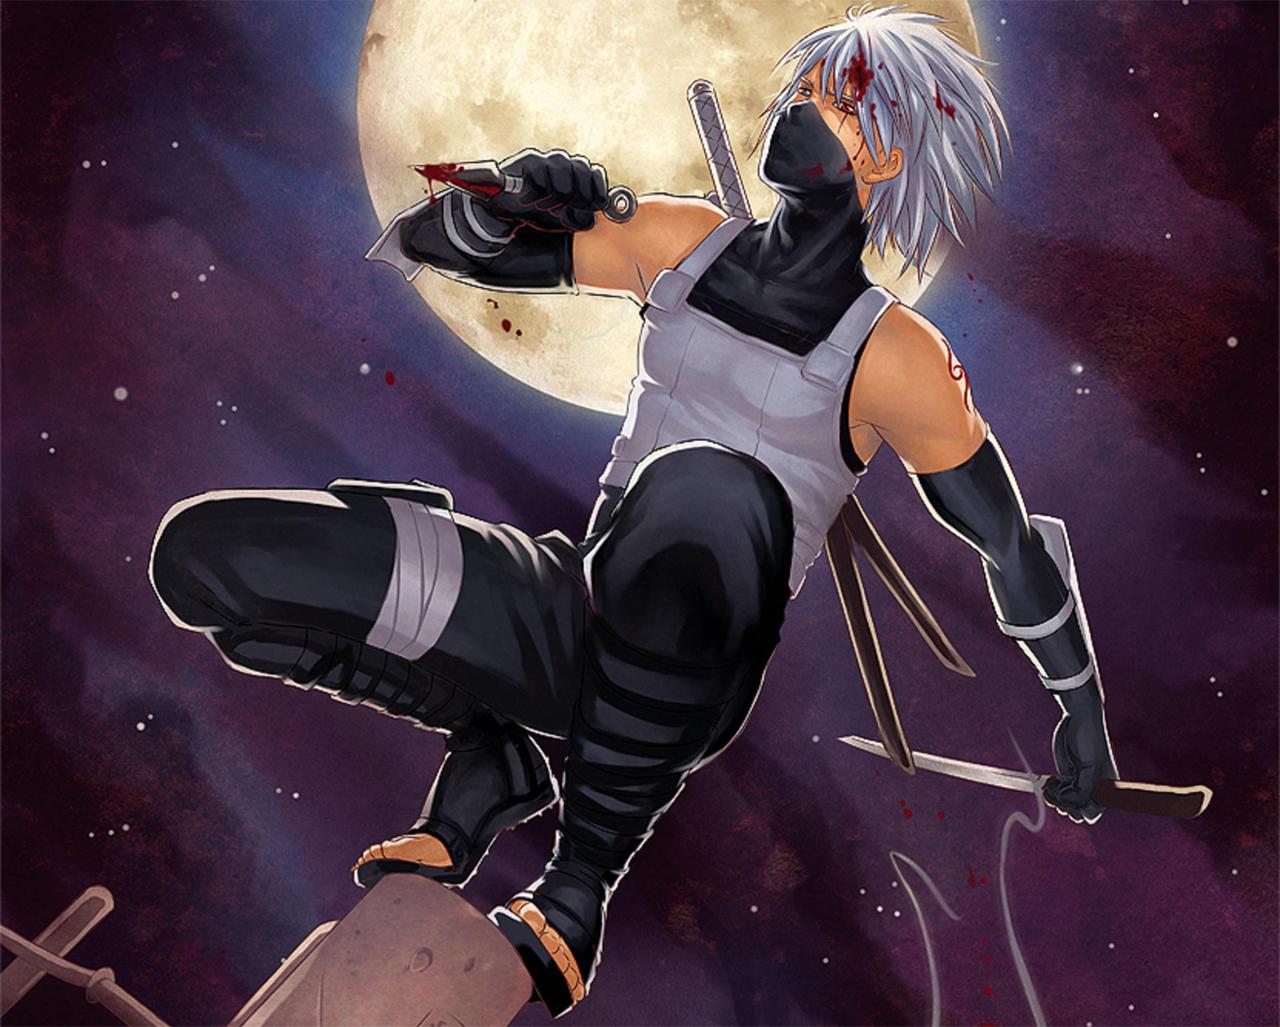 Anbu Kakashi Hatake Katana Kunai Blood Anime Konoha Ninja HD Wallpaper 1280x1027